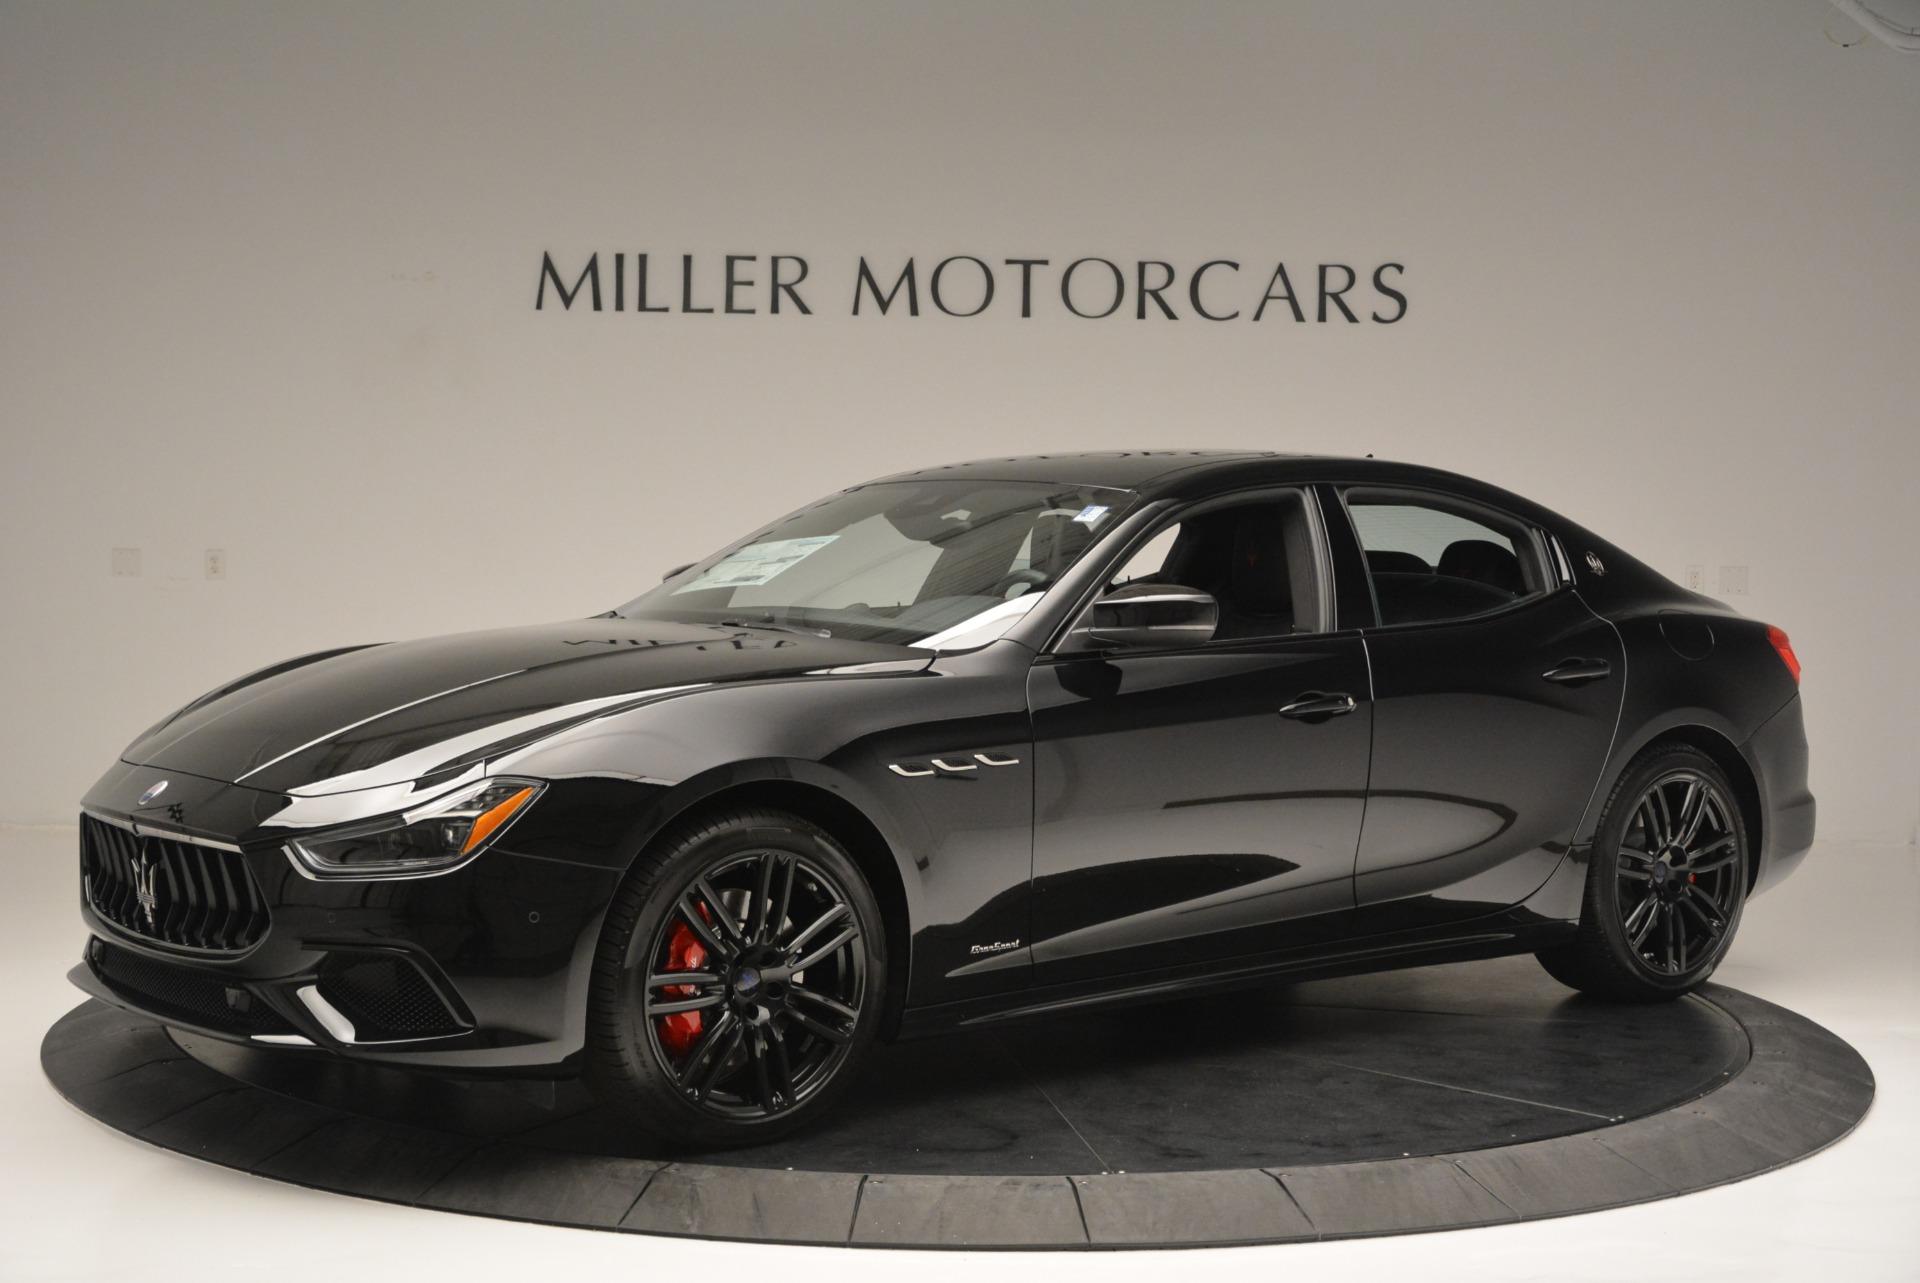 New 2018 Maserati Ghibli SQ4 GranSport Nerissimo For Sale In Westport, CT 2372_p2